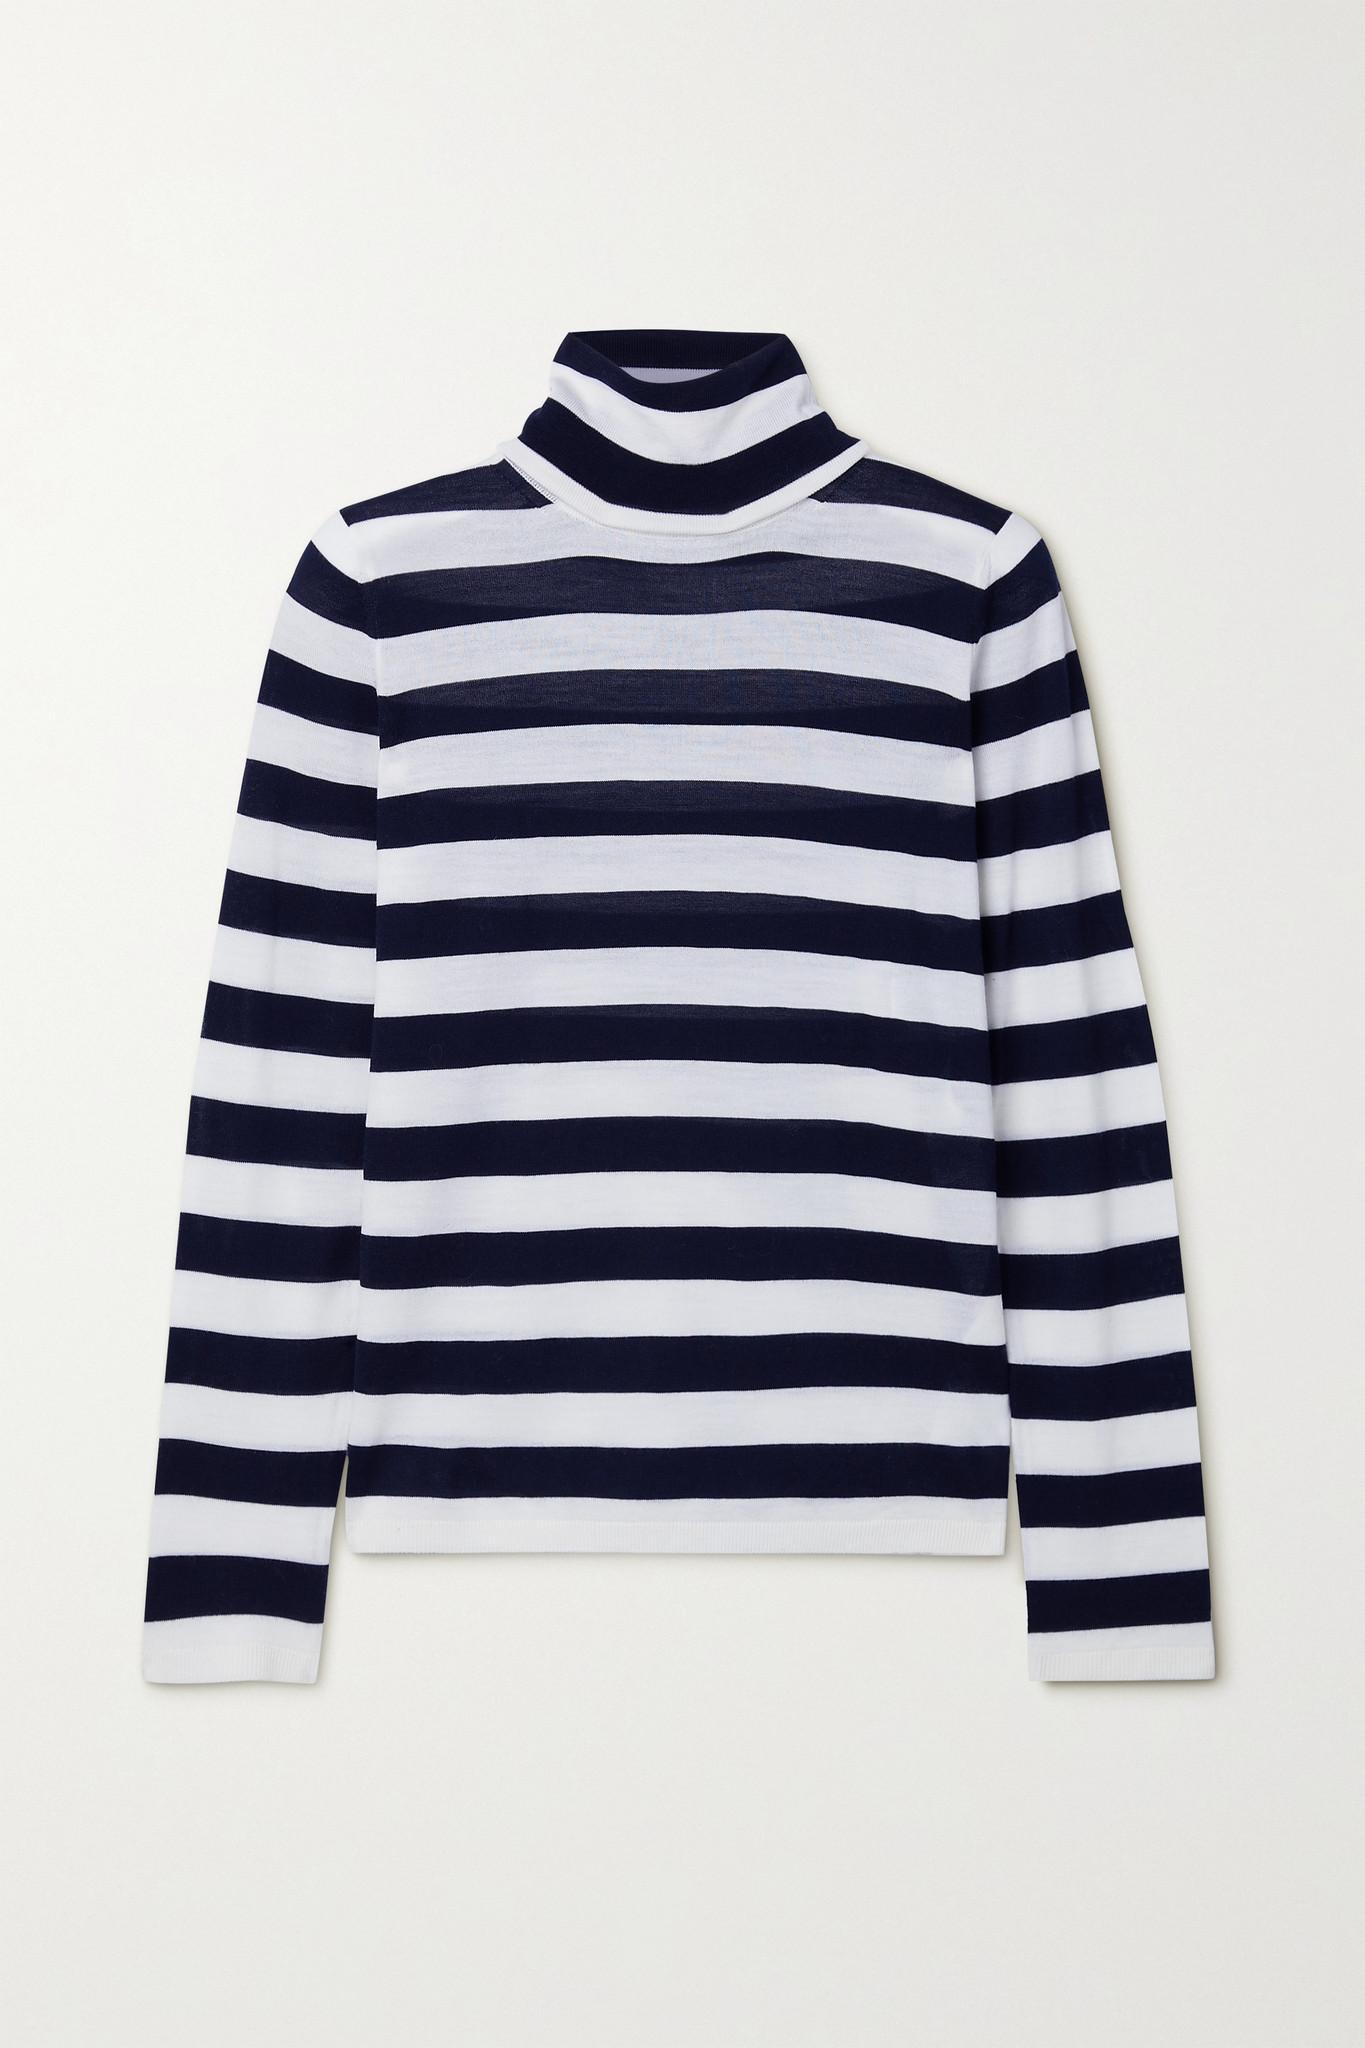 MAX MARA - Adelio Striped Wool Turtleneck Sweater - Blue - large